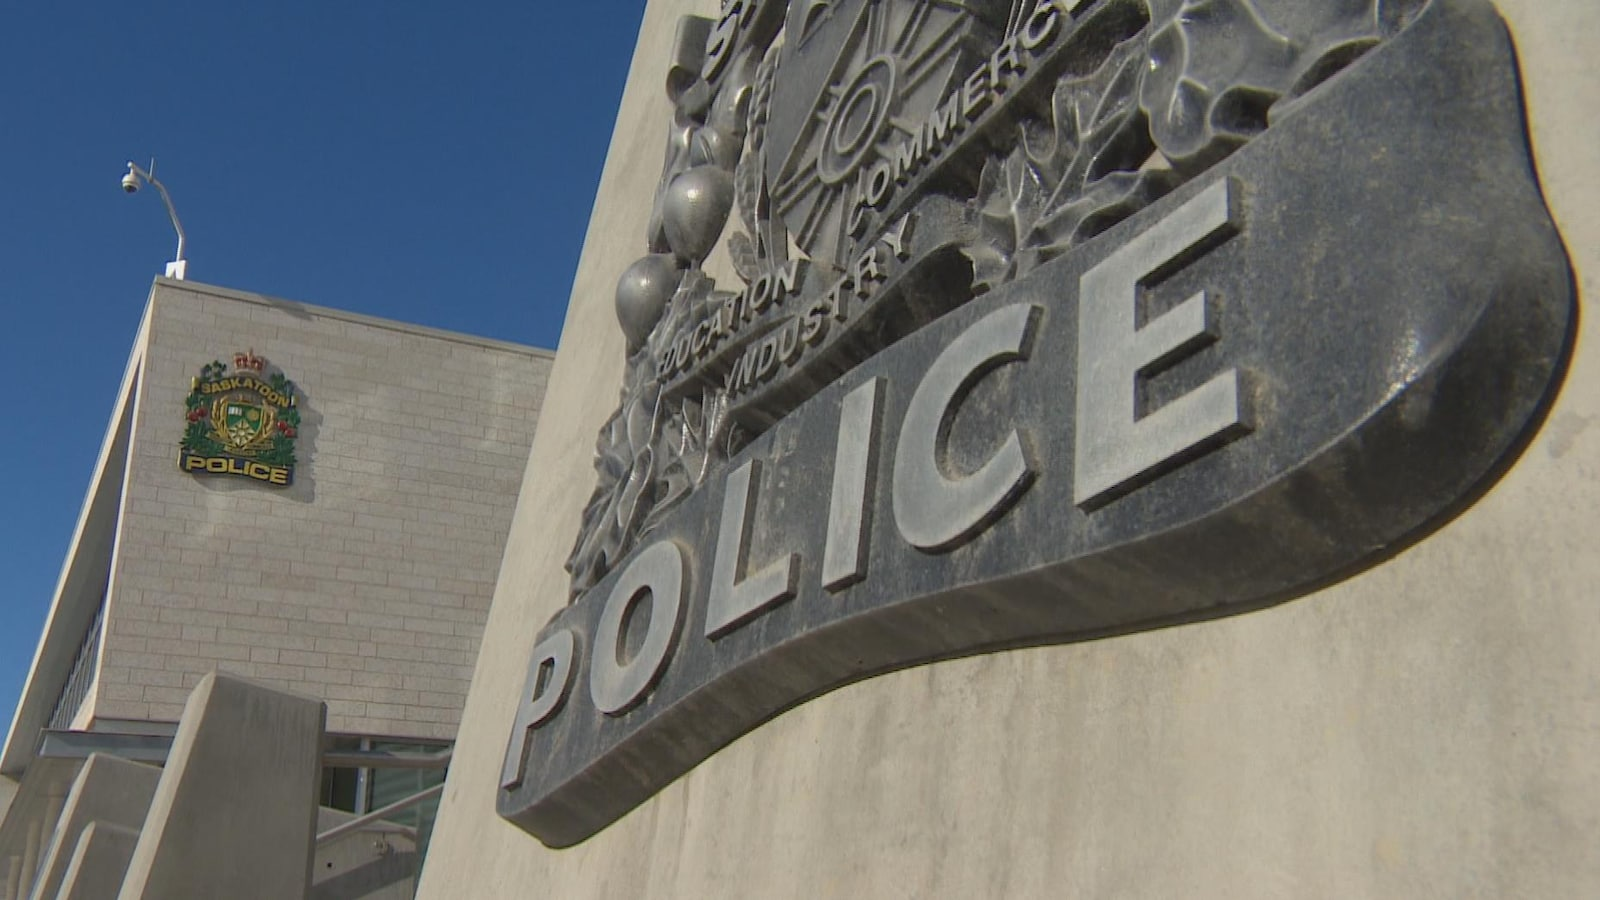 Logo de la police de Saskatoon sur un bâtiment.